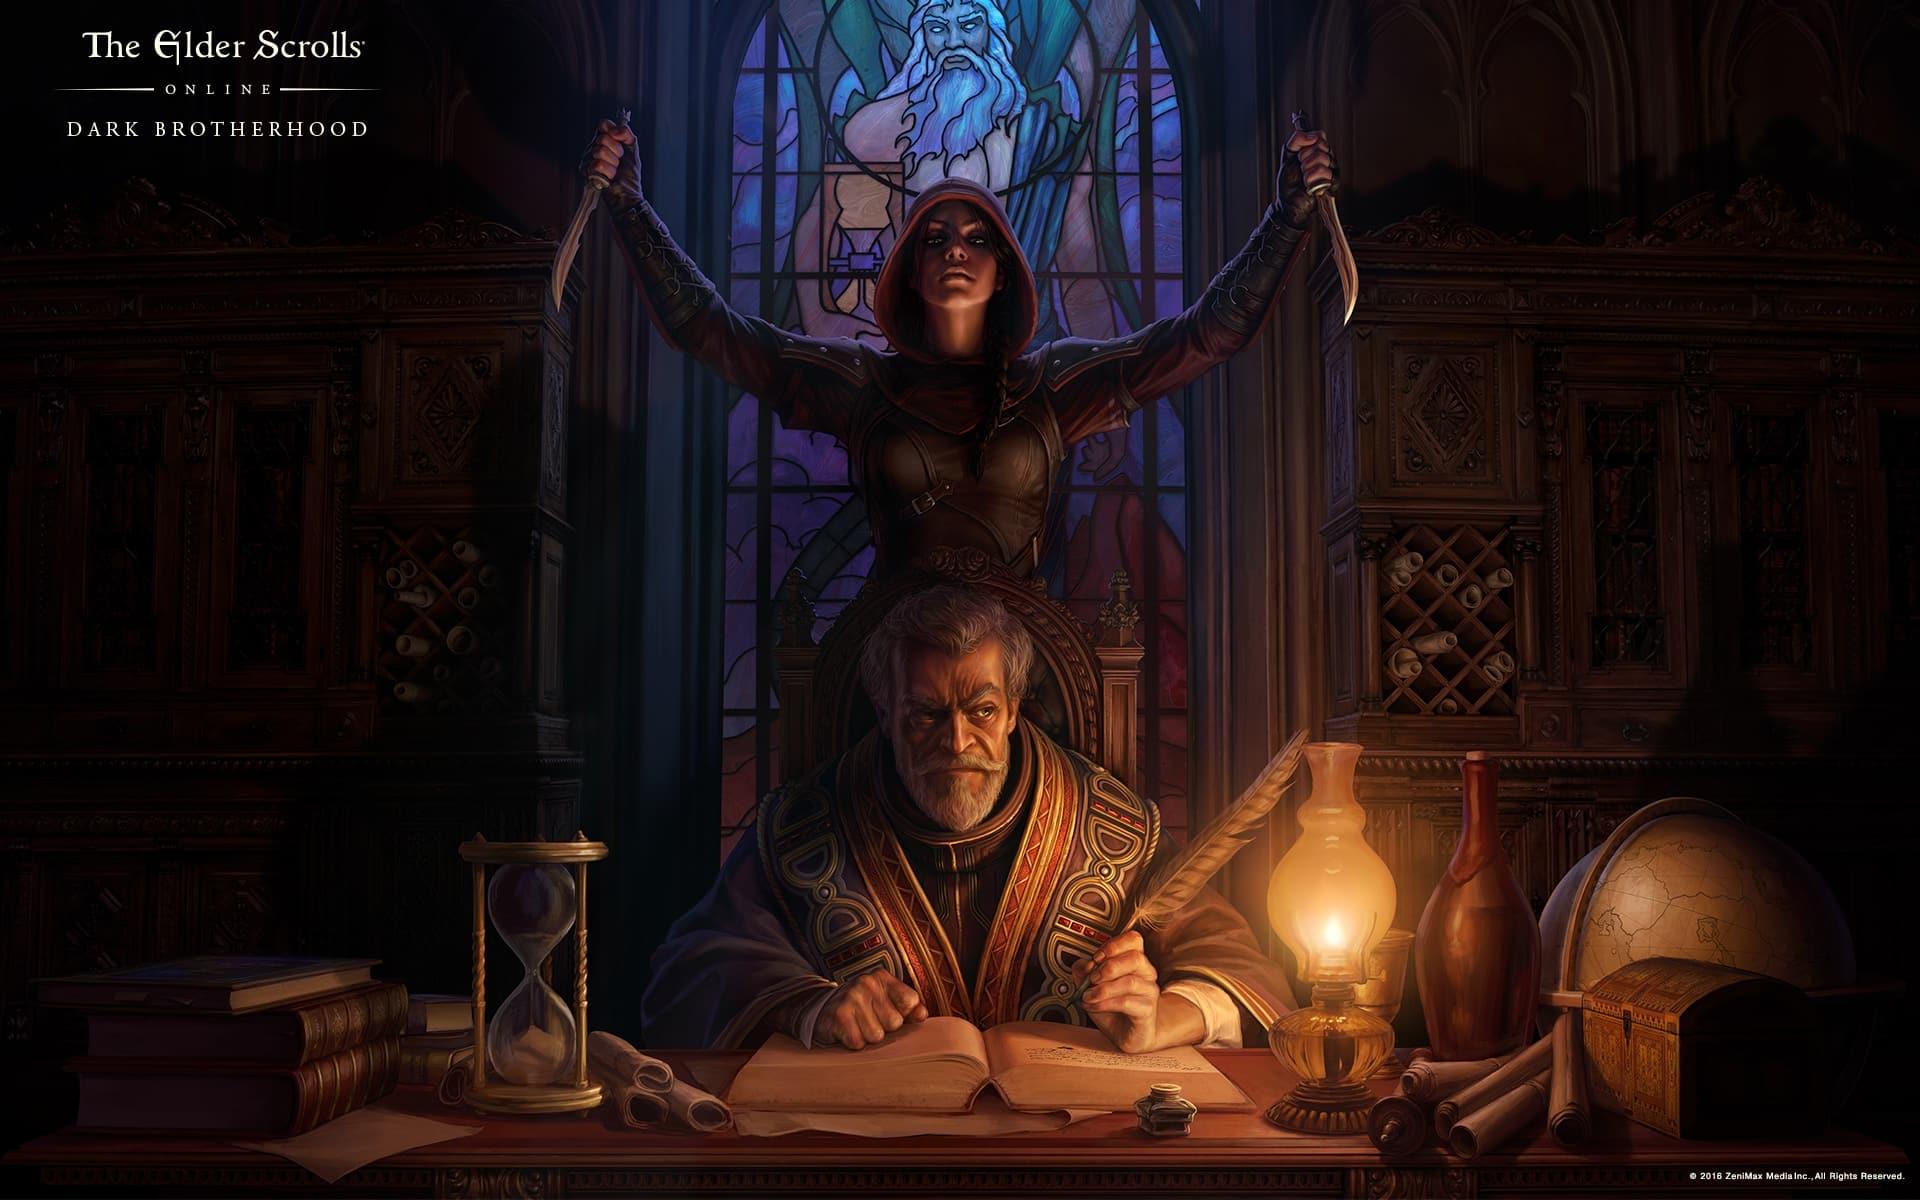 Dark Brotherhood: Launch Details - The Elder Scrolls Online